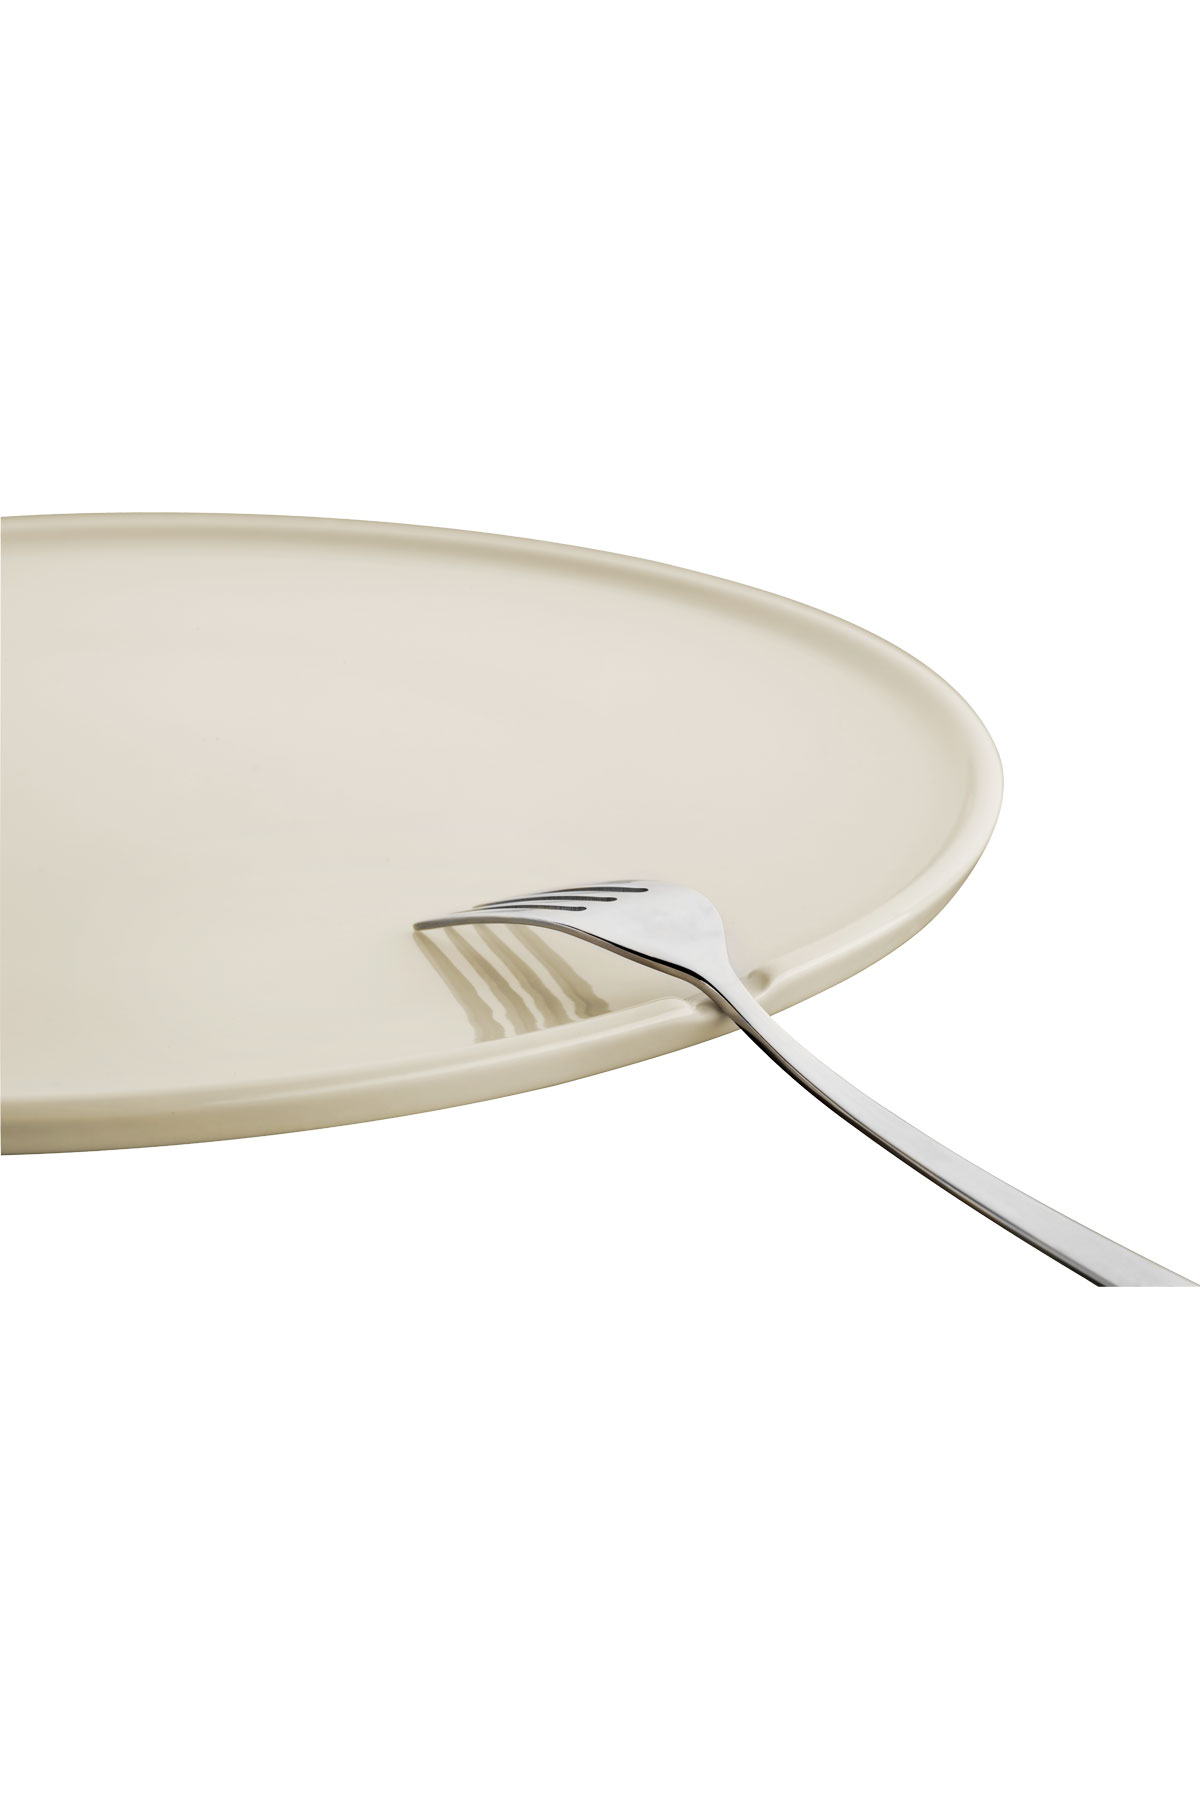 Kütahya Porselen Chef Taste Of 19 cm Düz Tabak Krem